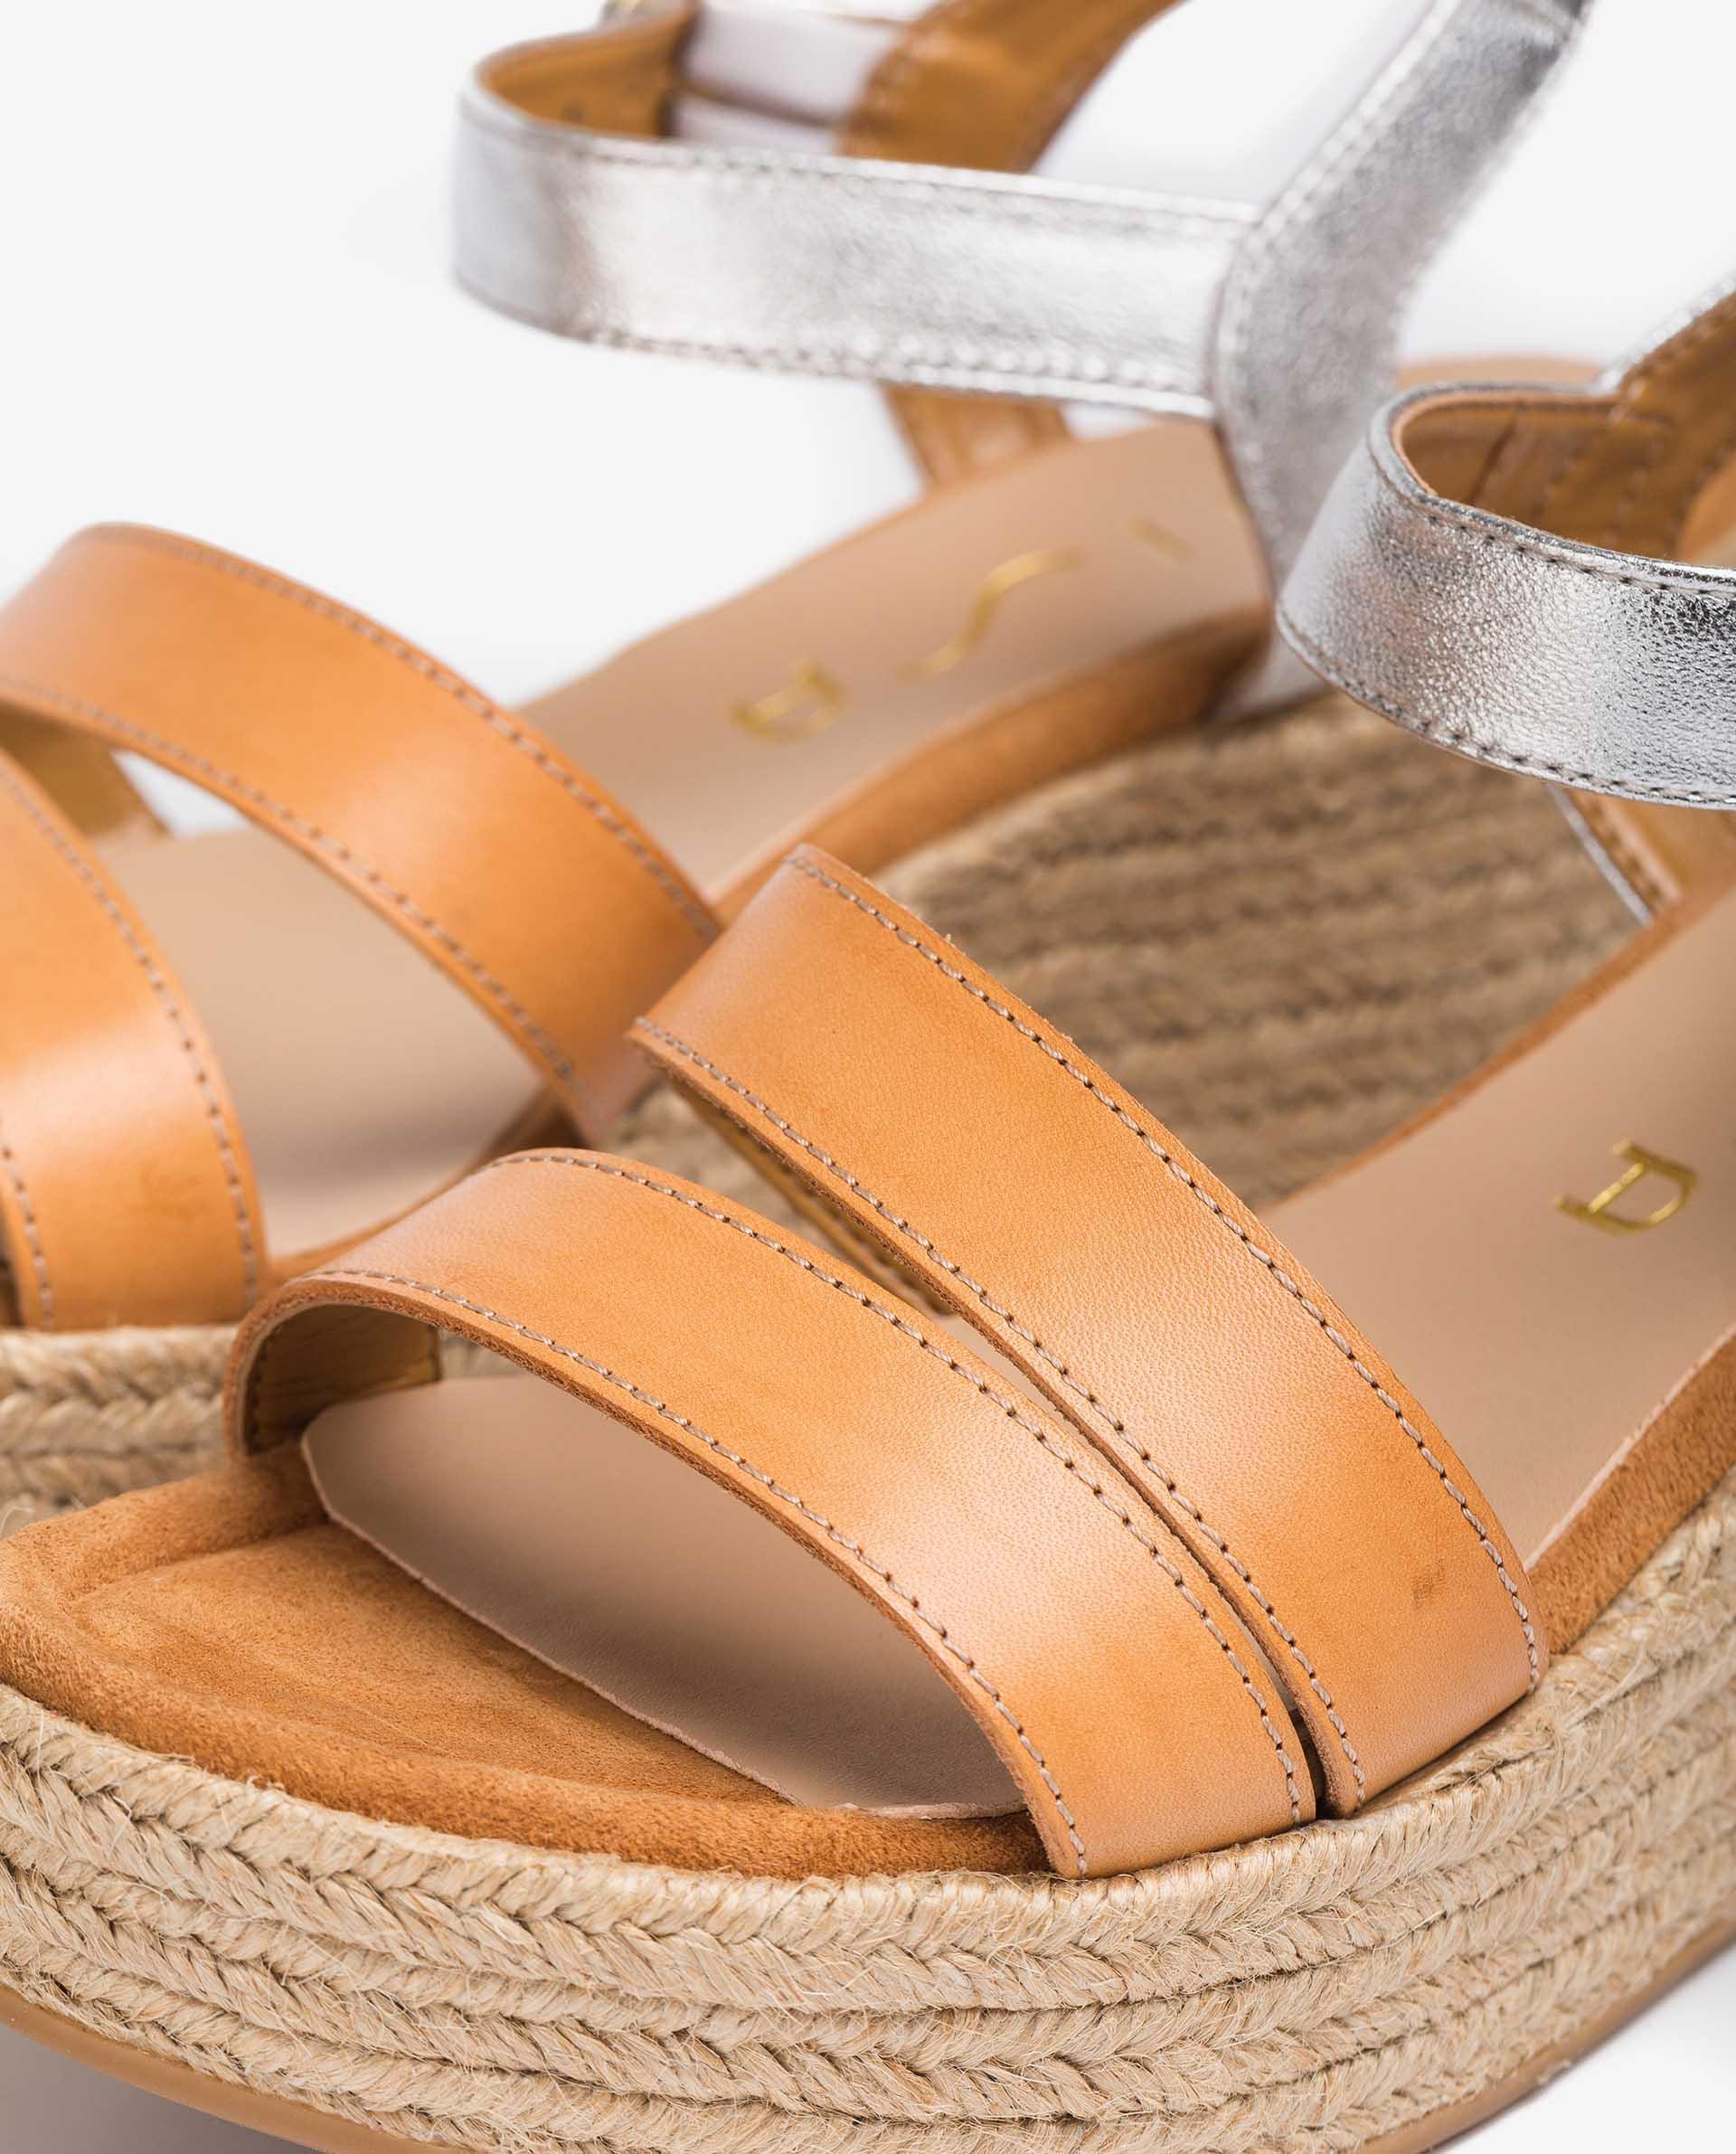 UNISA Materials contrast sandals KEVAR_RAN_LMT 2